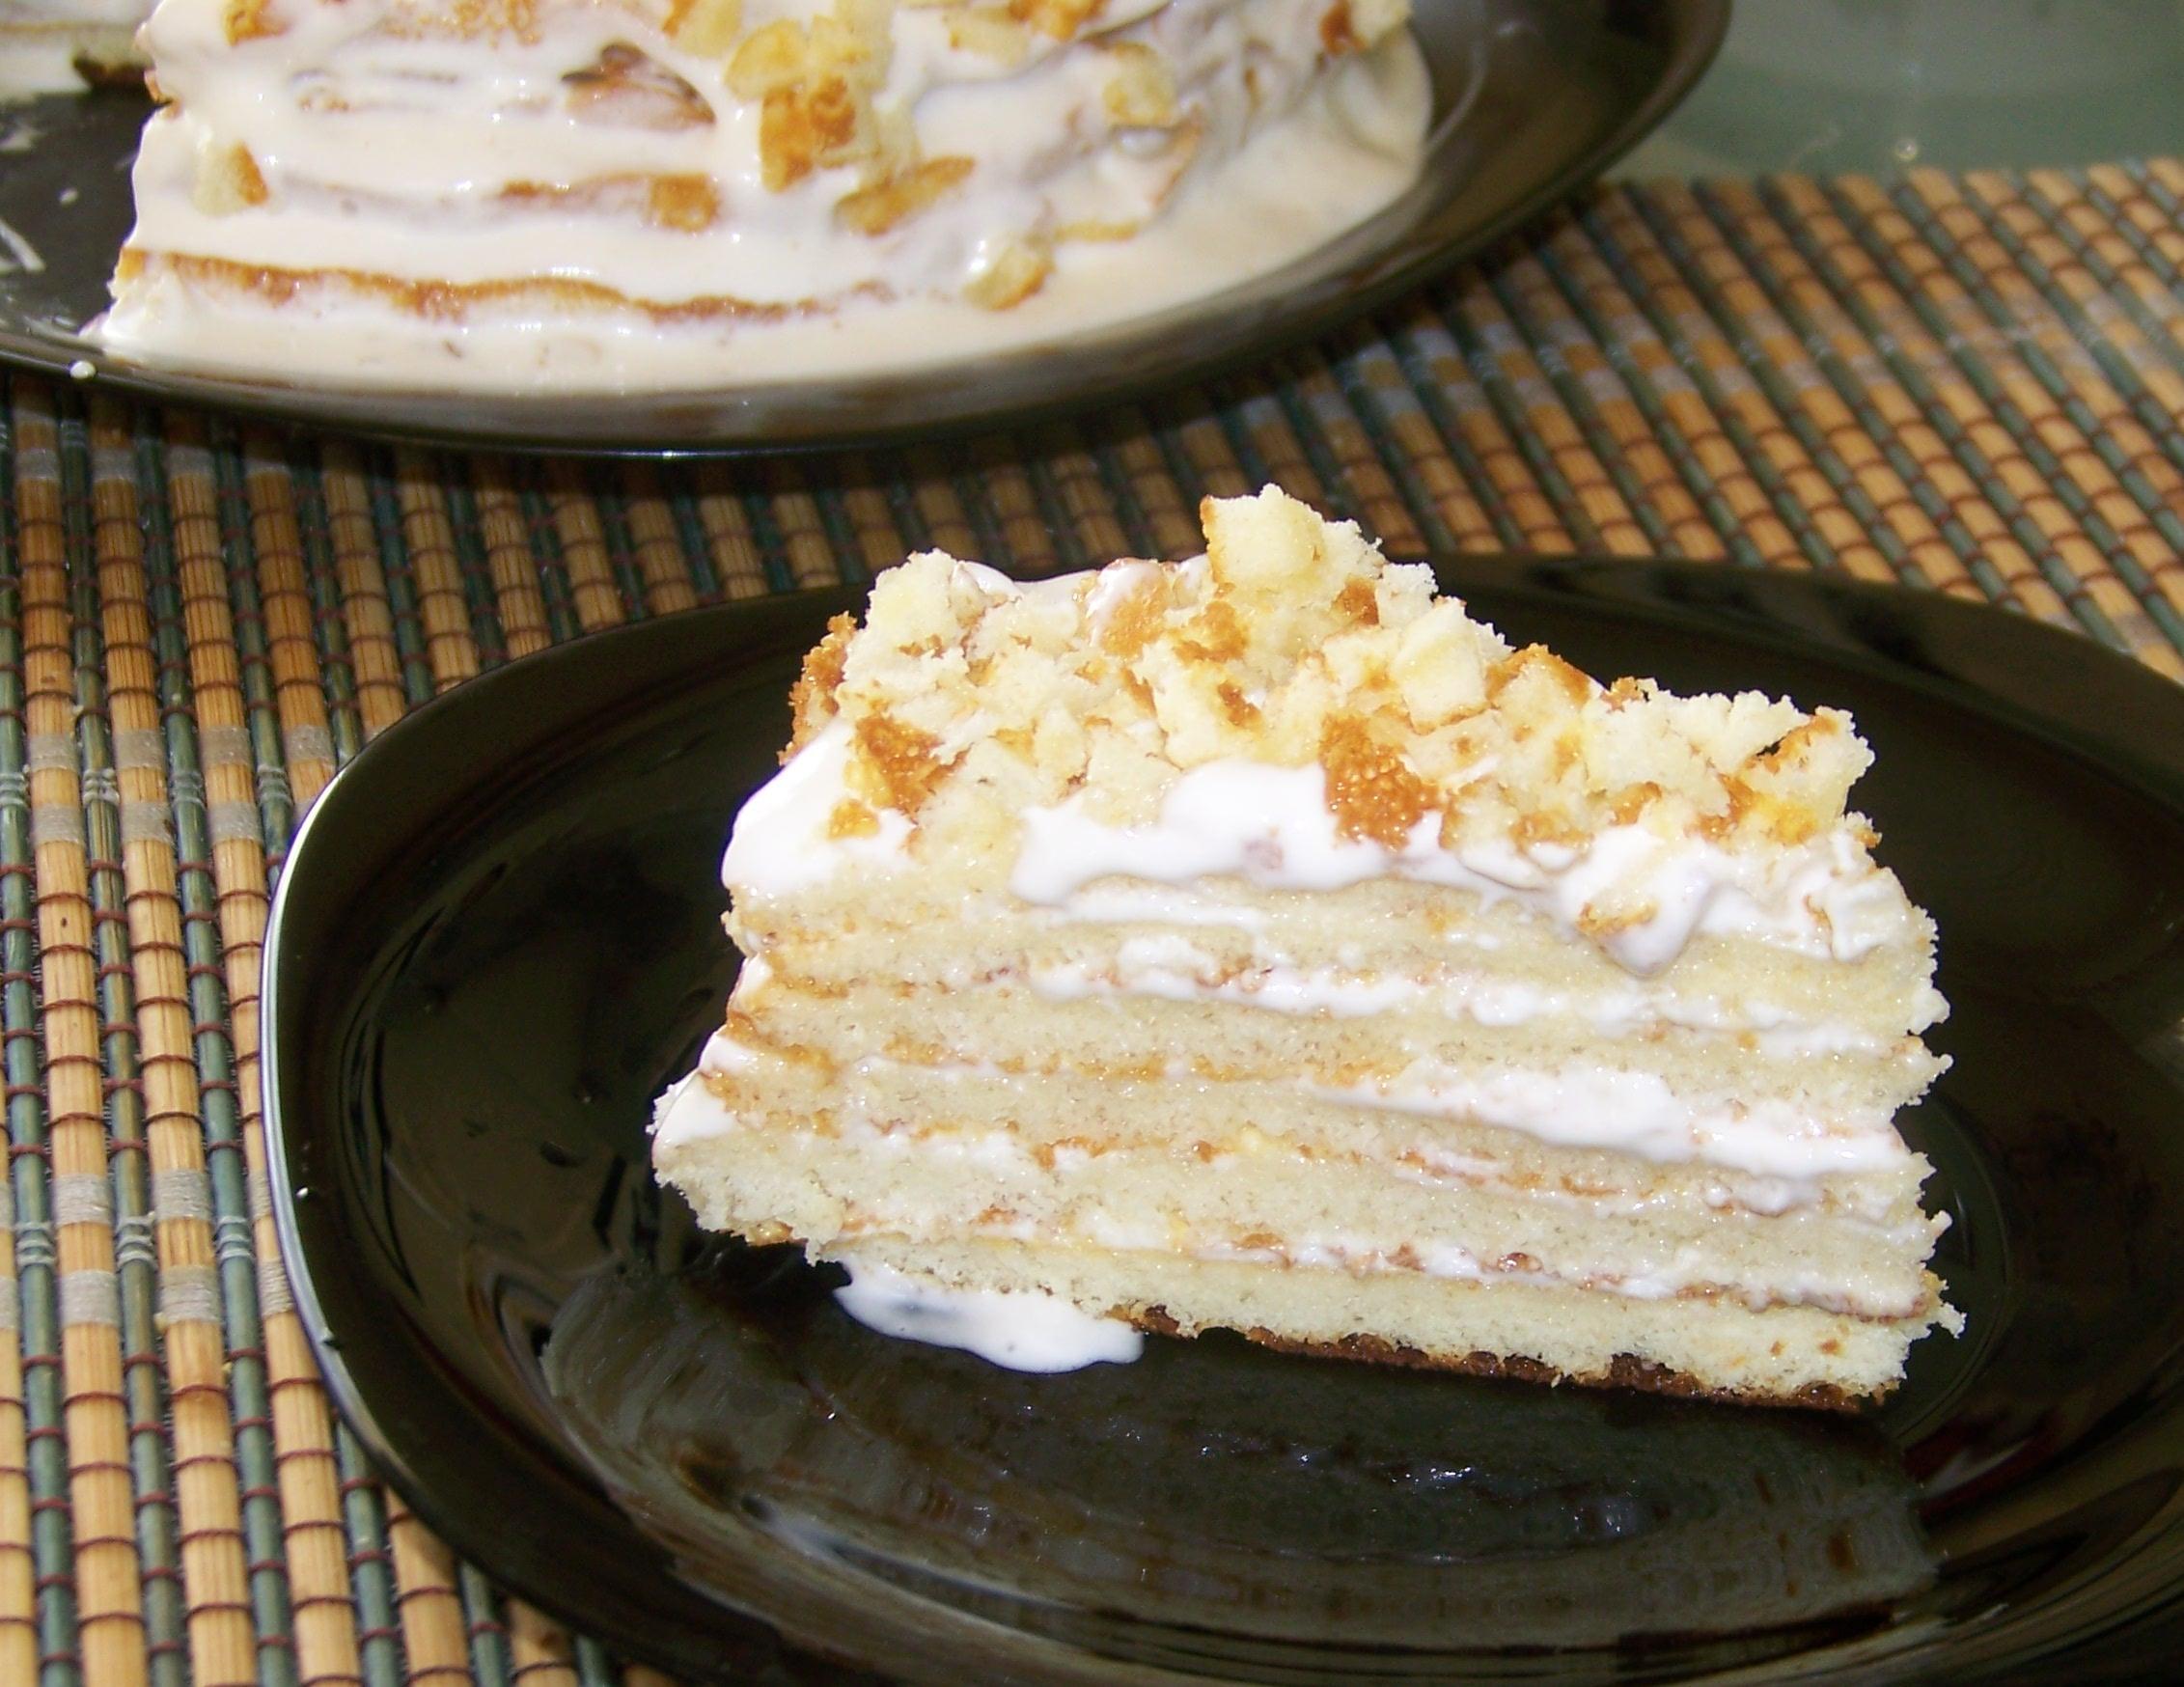 Торт сгущенка, яйца, мука, крем сметана. Королевский торт без масла.